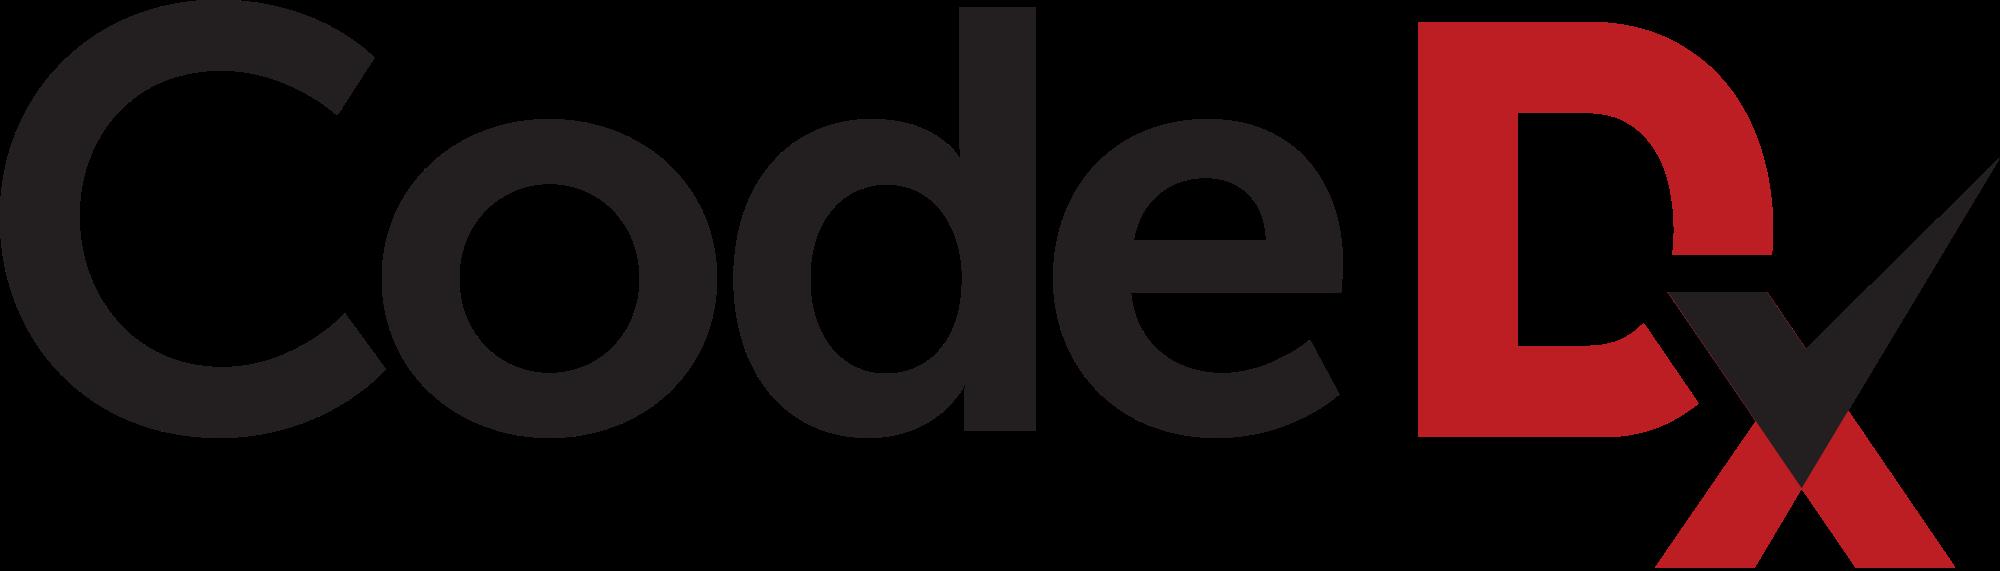 Dx logo png 6 » PNG Image.